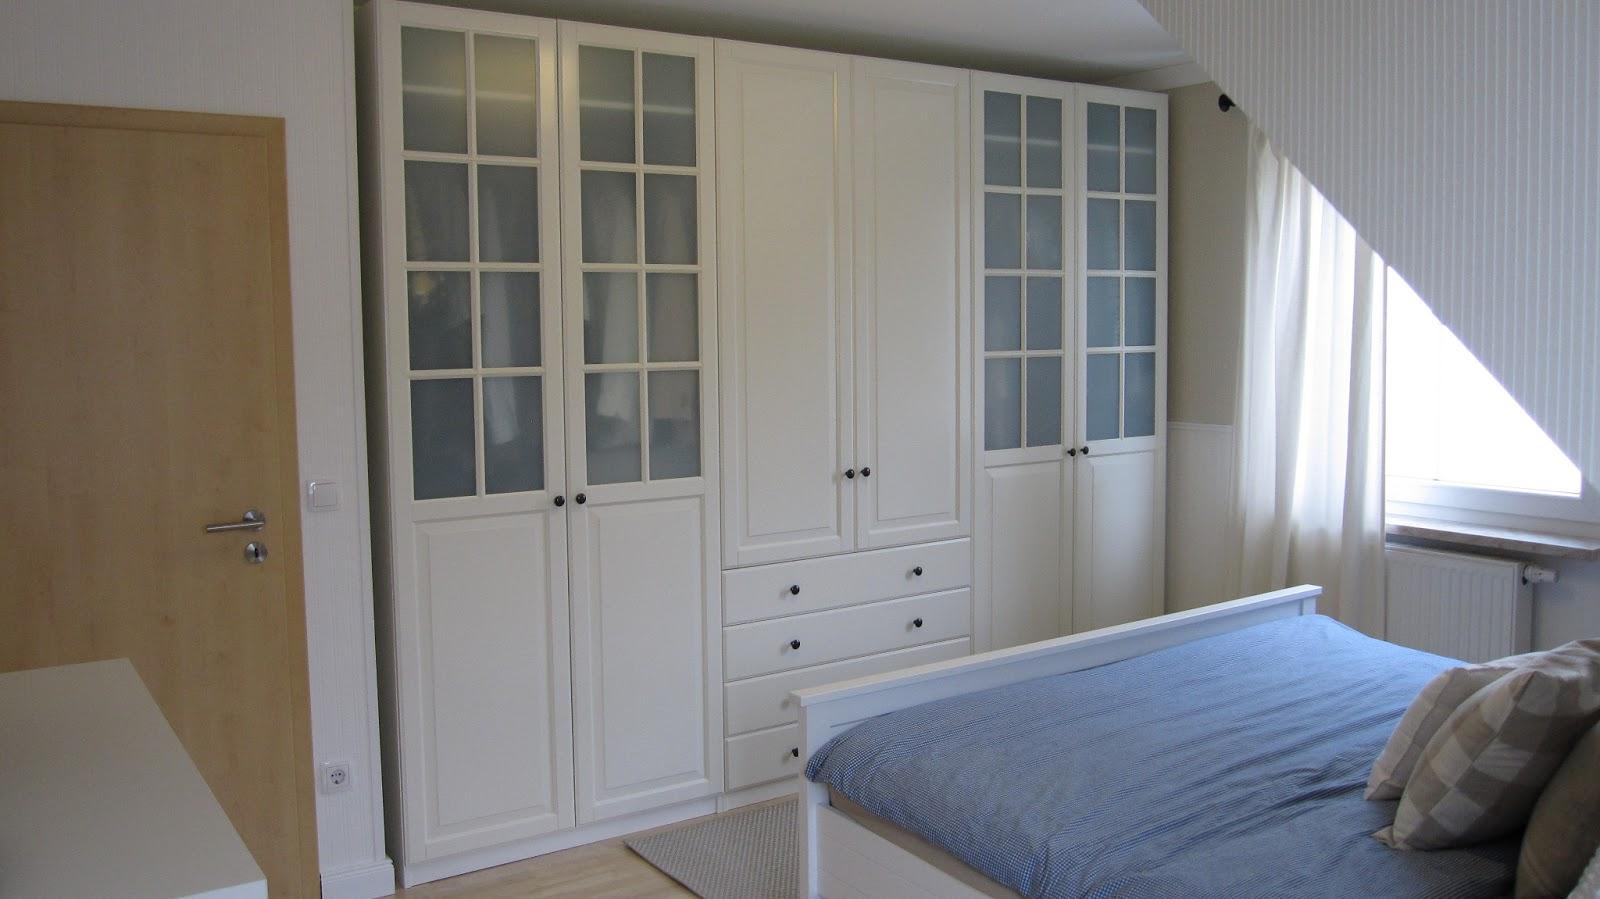 kleines gelbes haus april 2013. Black Bedroom Furniture Sets. Home Design Ideas